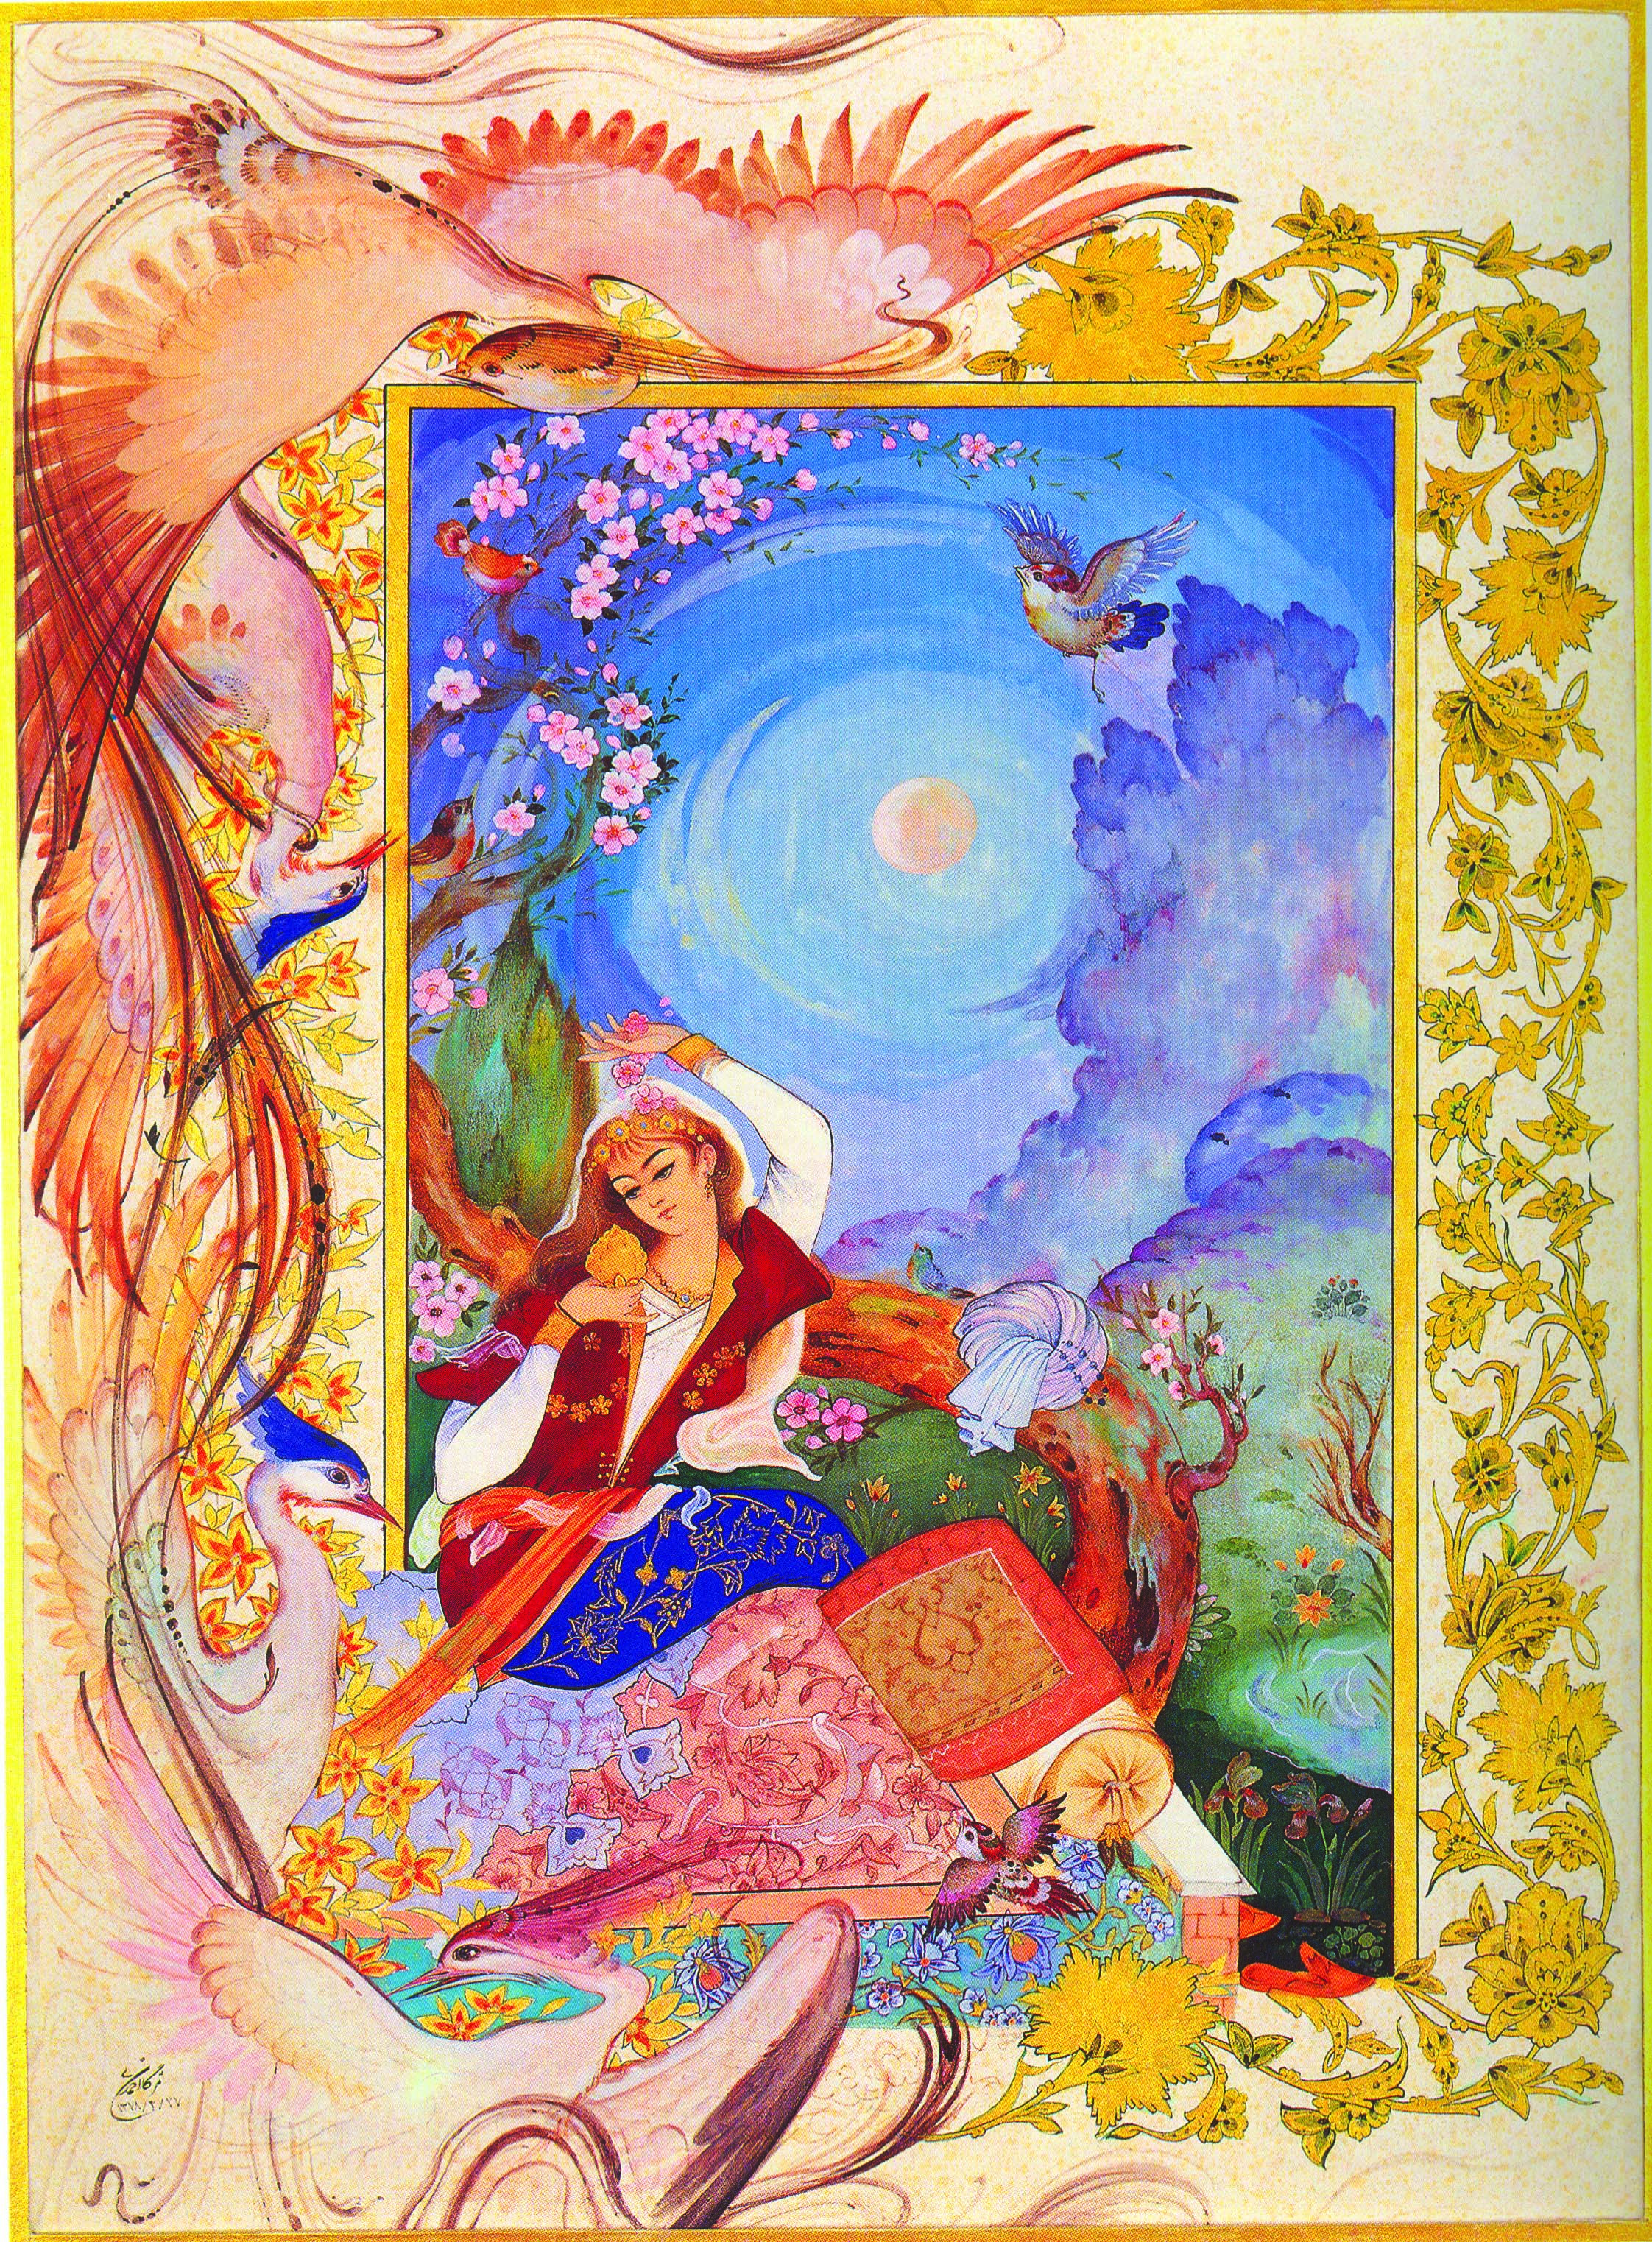 Http S3 Picofile Com File 8211463392 Iranian Miniatures 22 Jpg Painting Sanat Minyaturler